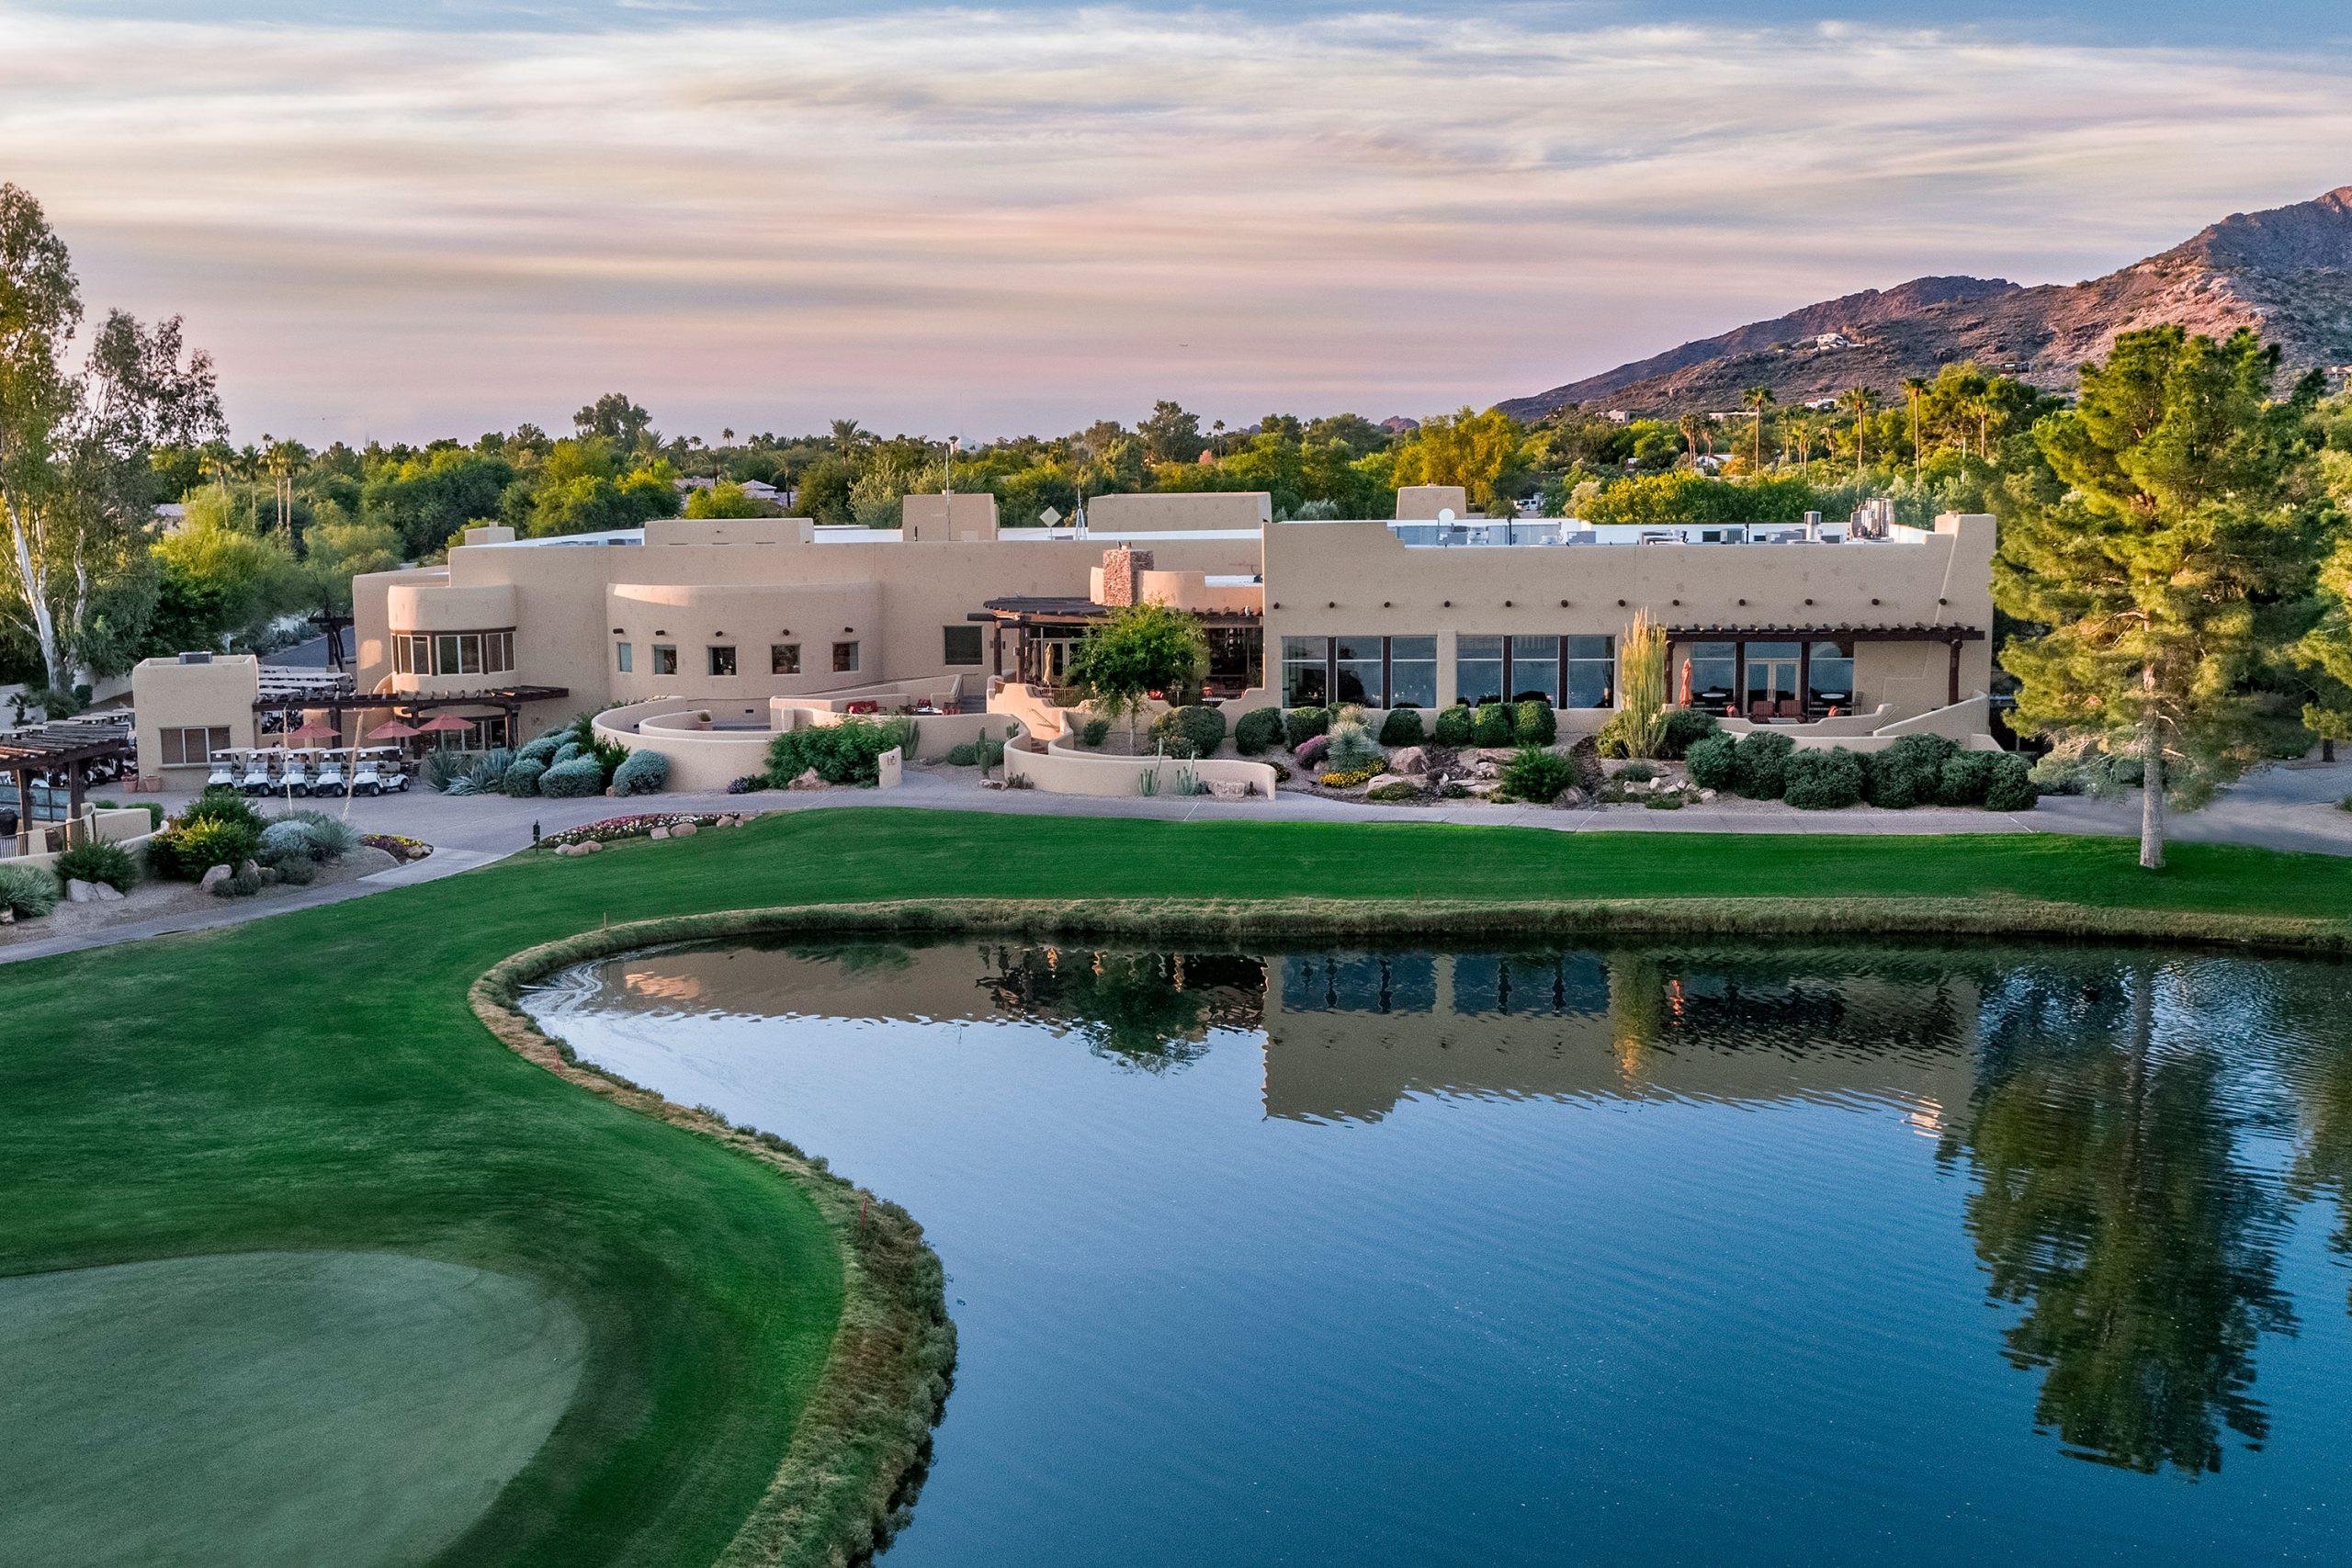 Photo courtesy JW Marriott Scottsdale Camelback Inn Resort & Spa